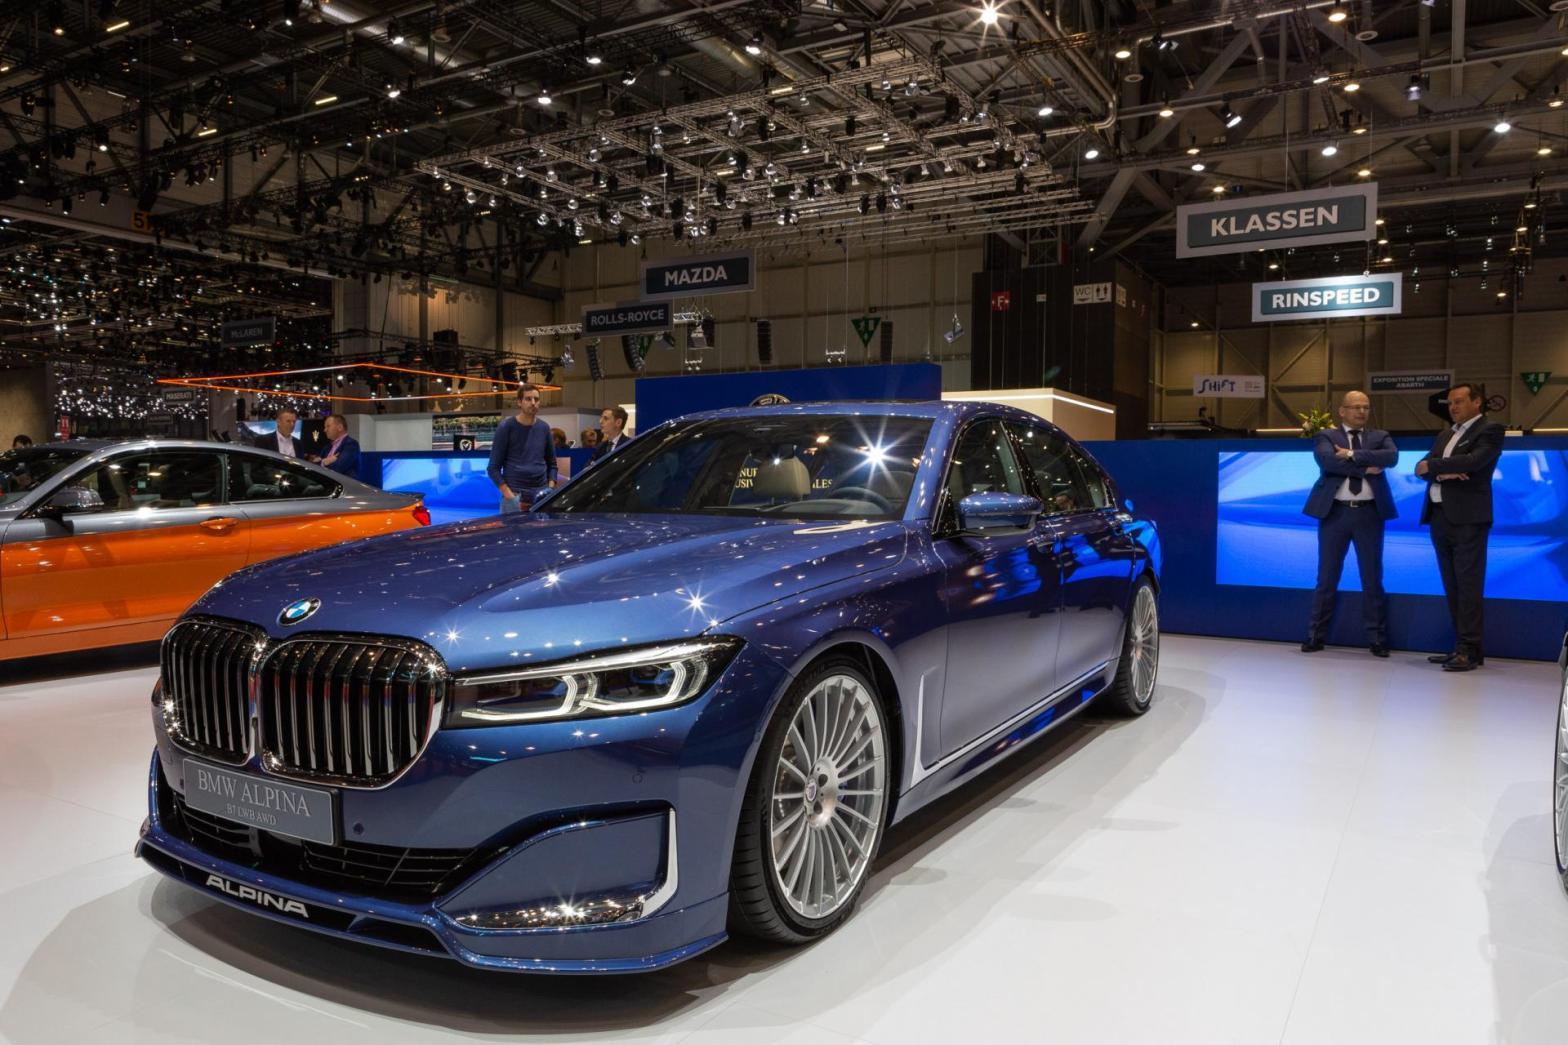 2020 Alpina B7 Xdrive Namaste Car